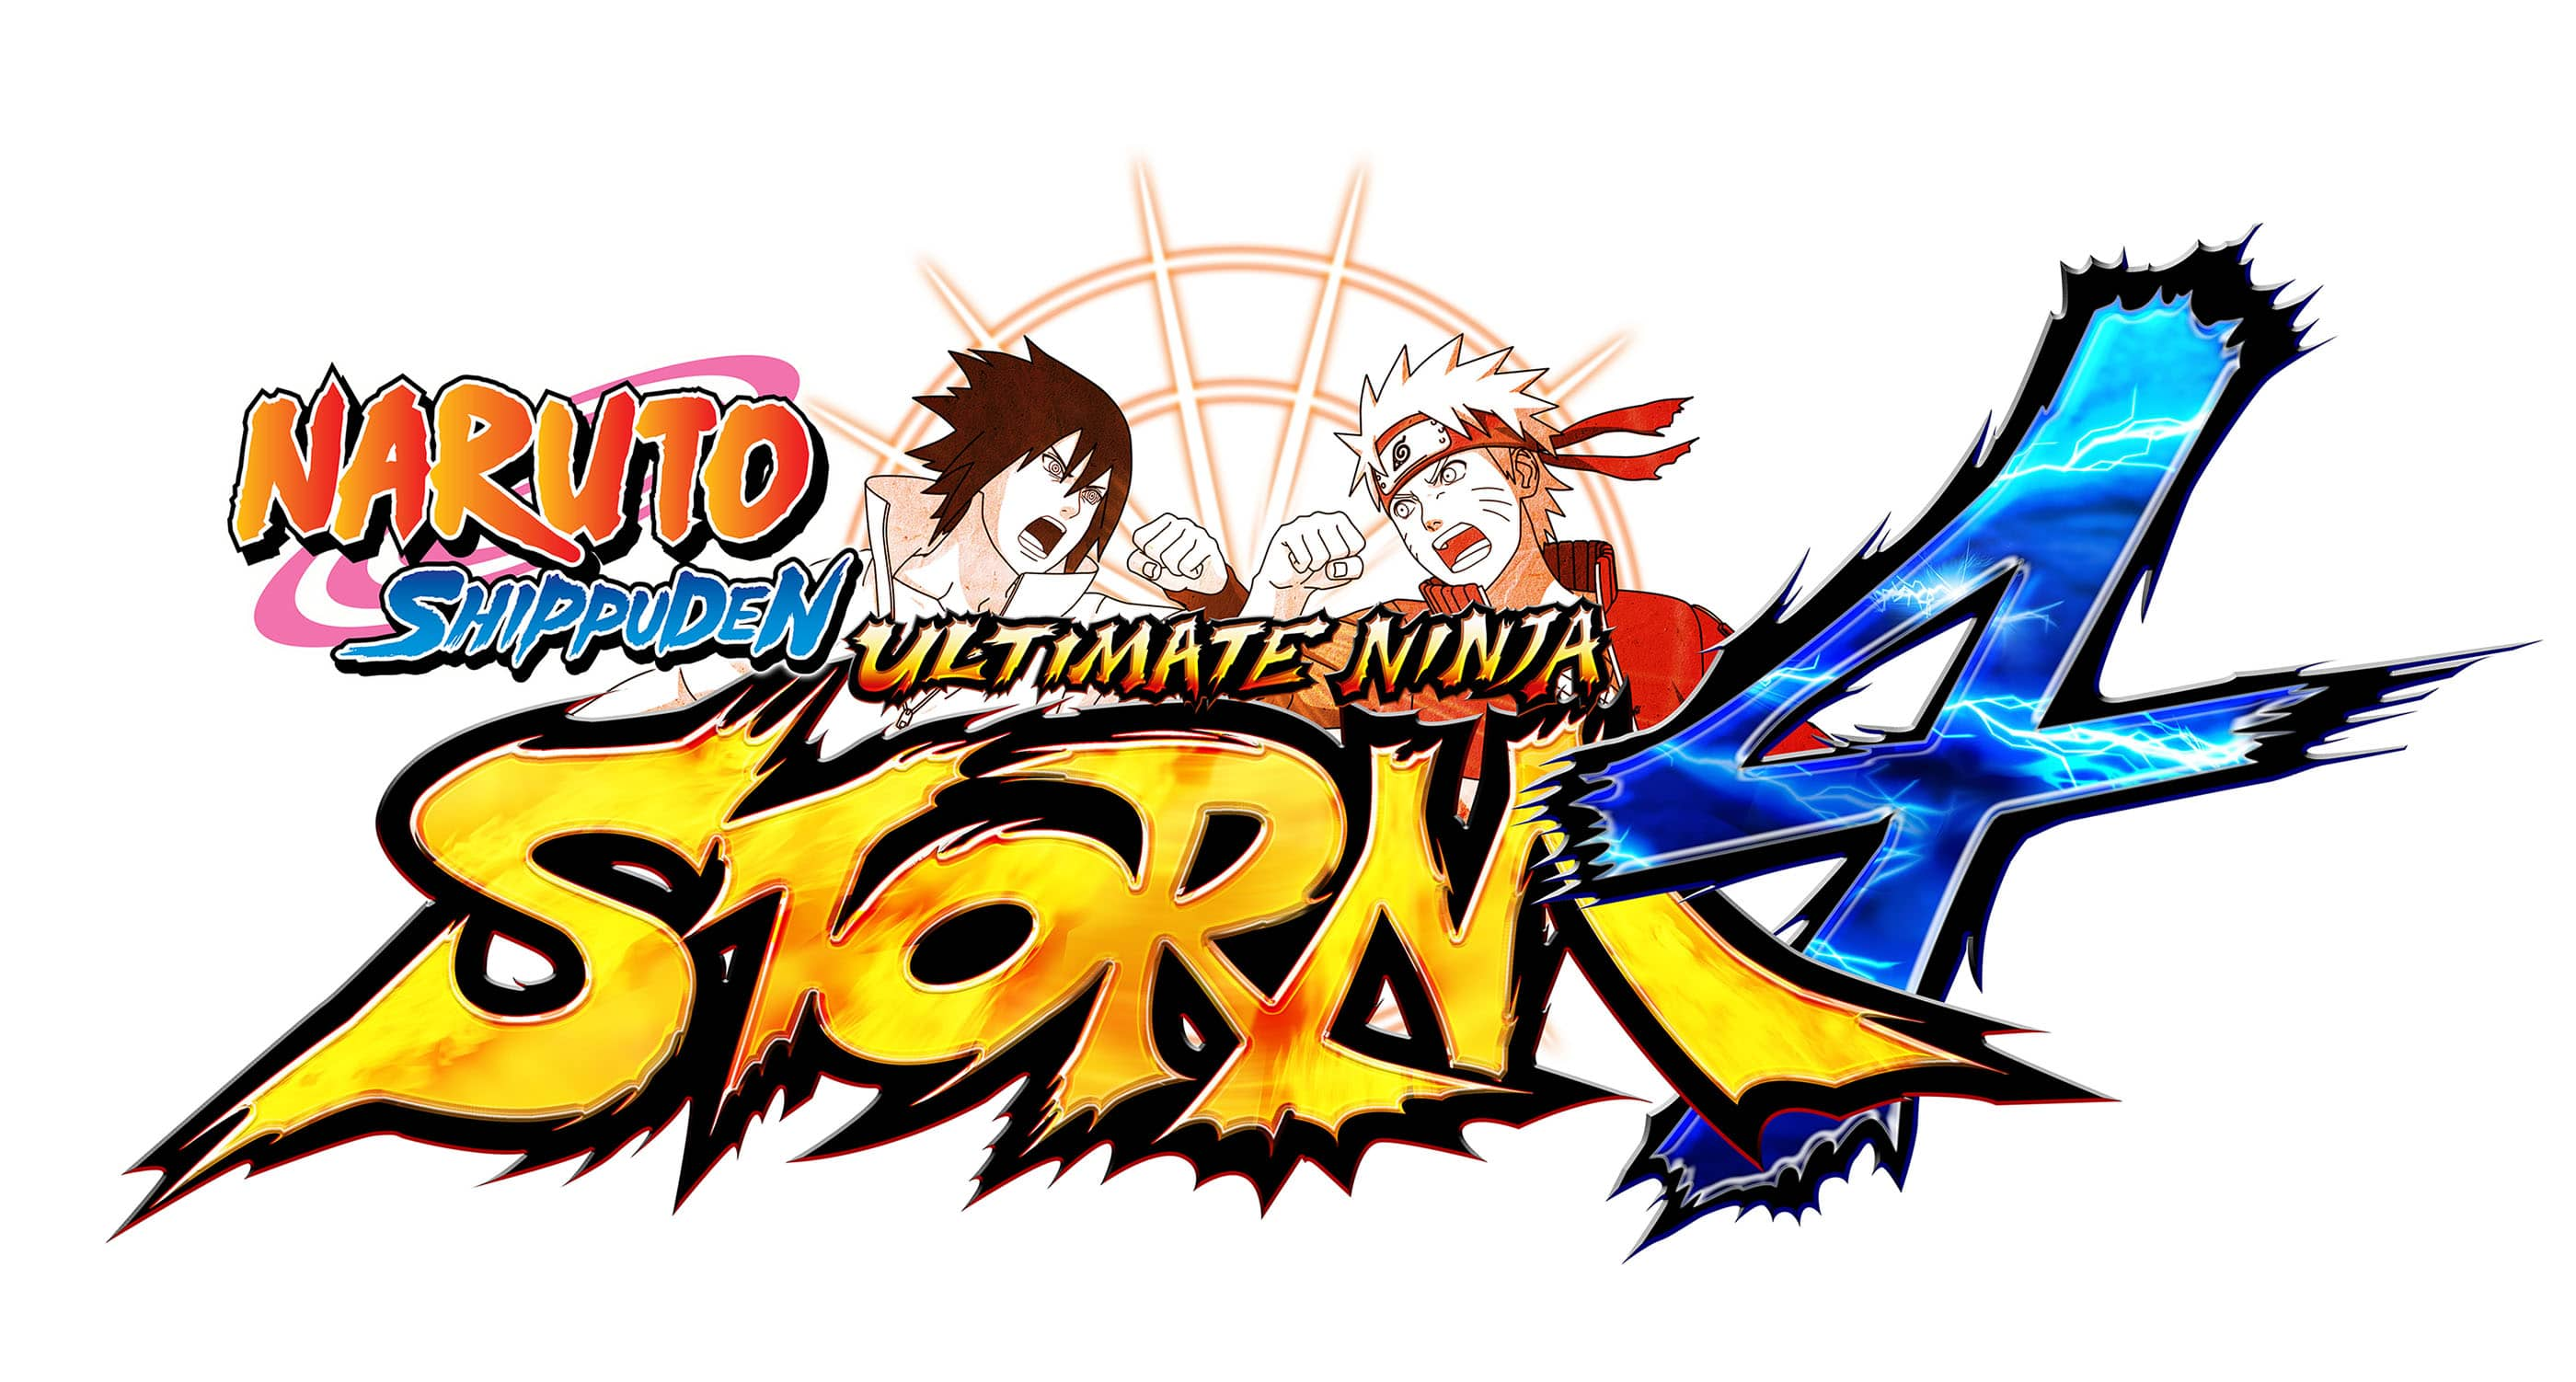 Naruto Storm 4 : un livestream programmé cette semaine